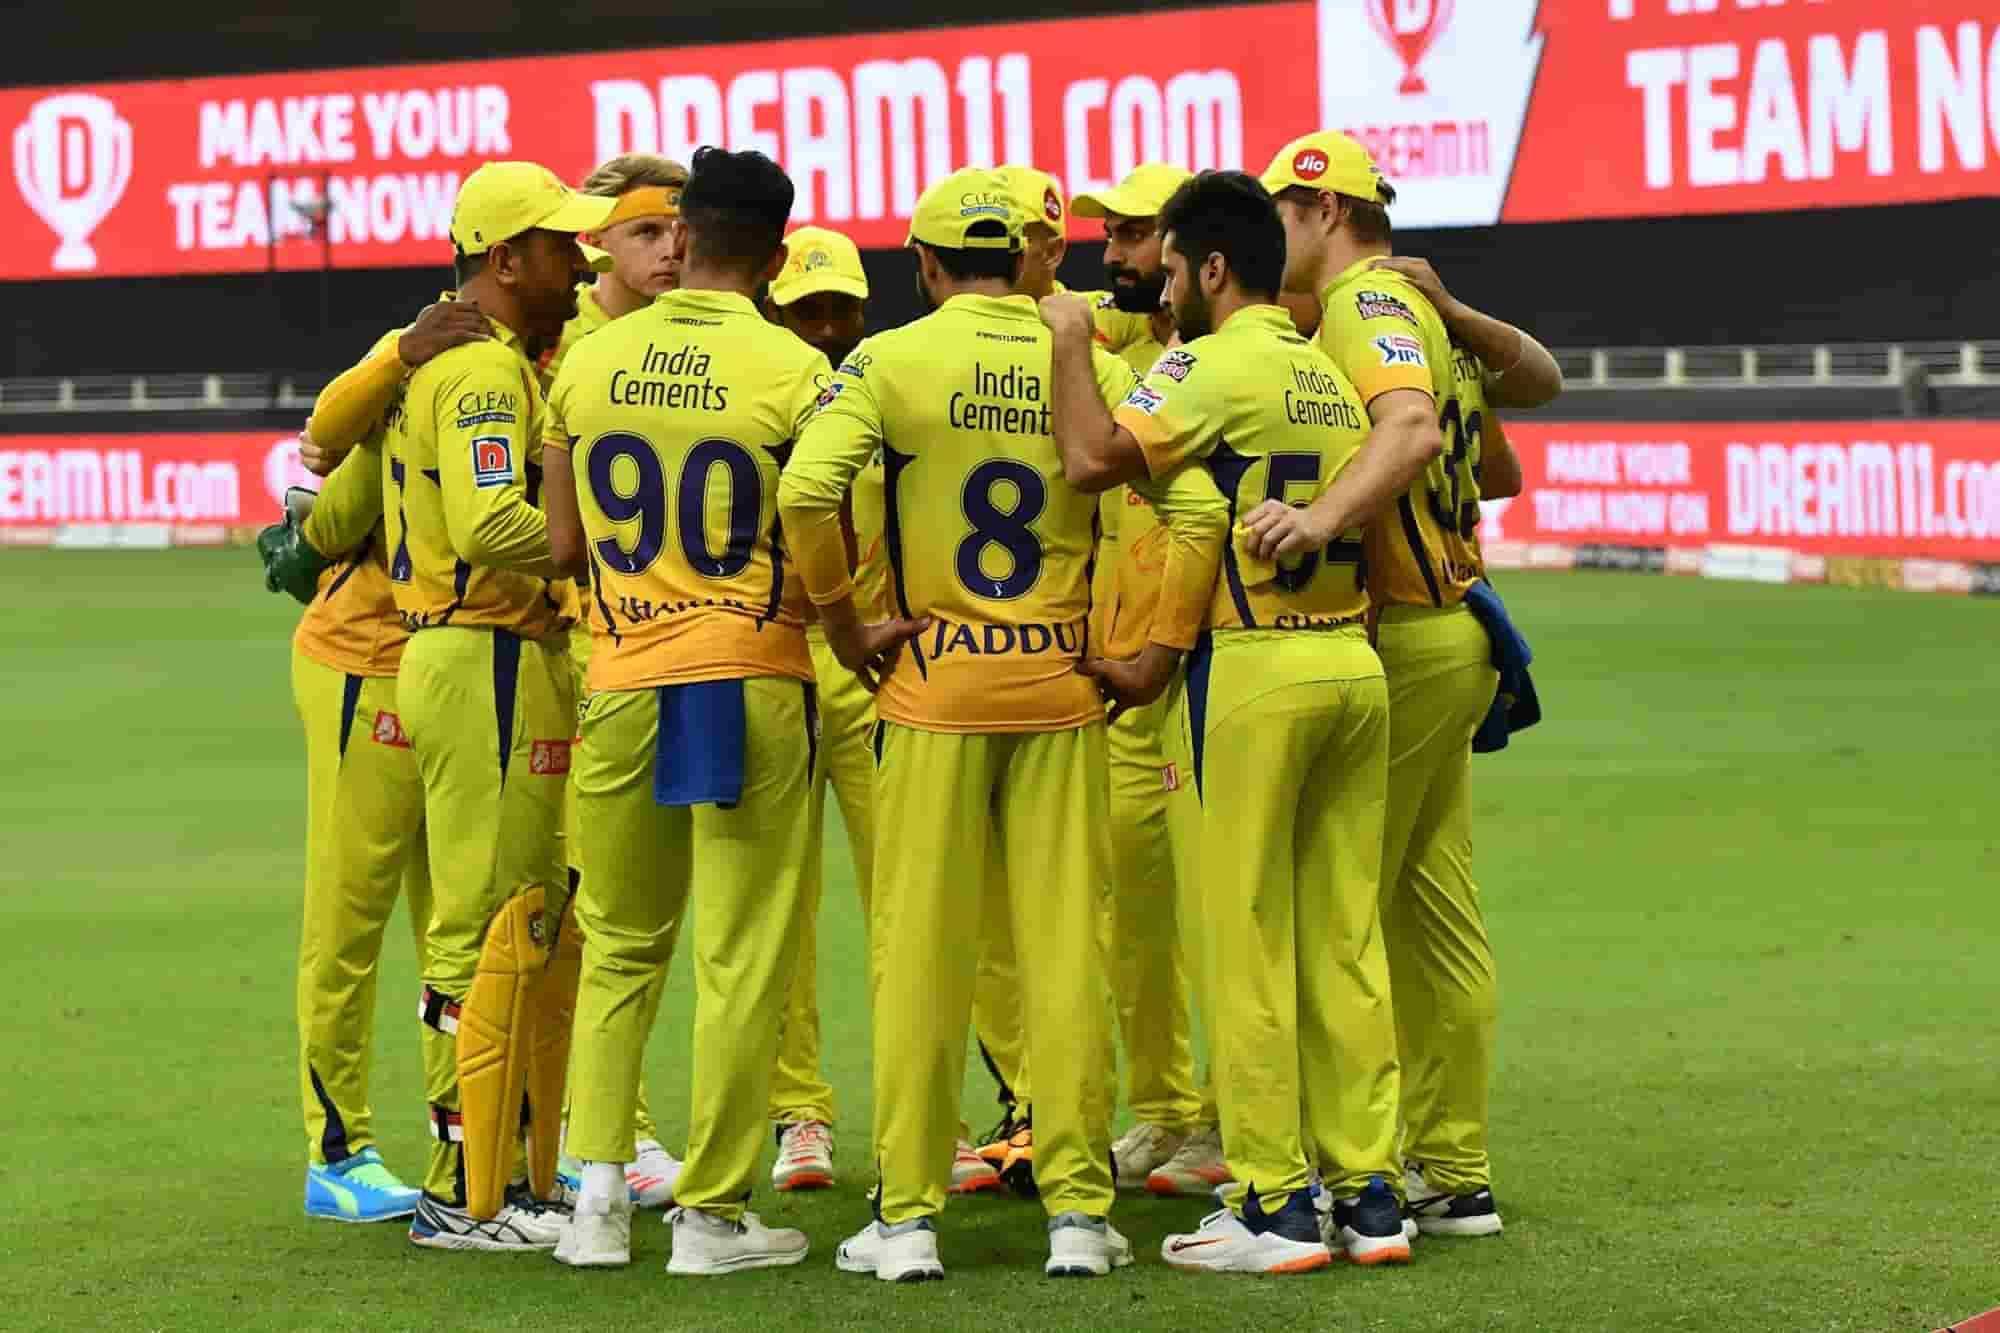 IPL 2021 Are Chennai Super Kings hinting at Narayan Jagadeesan becoming Dhoni's replacement in their